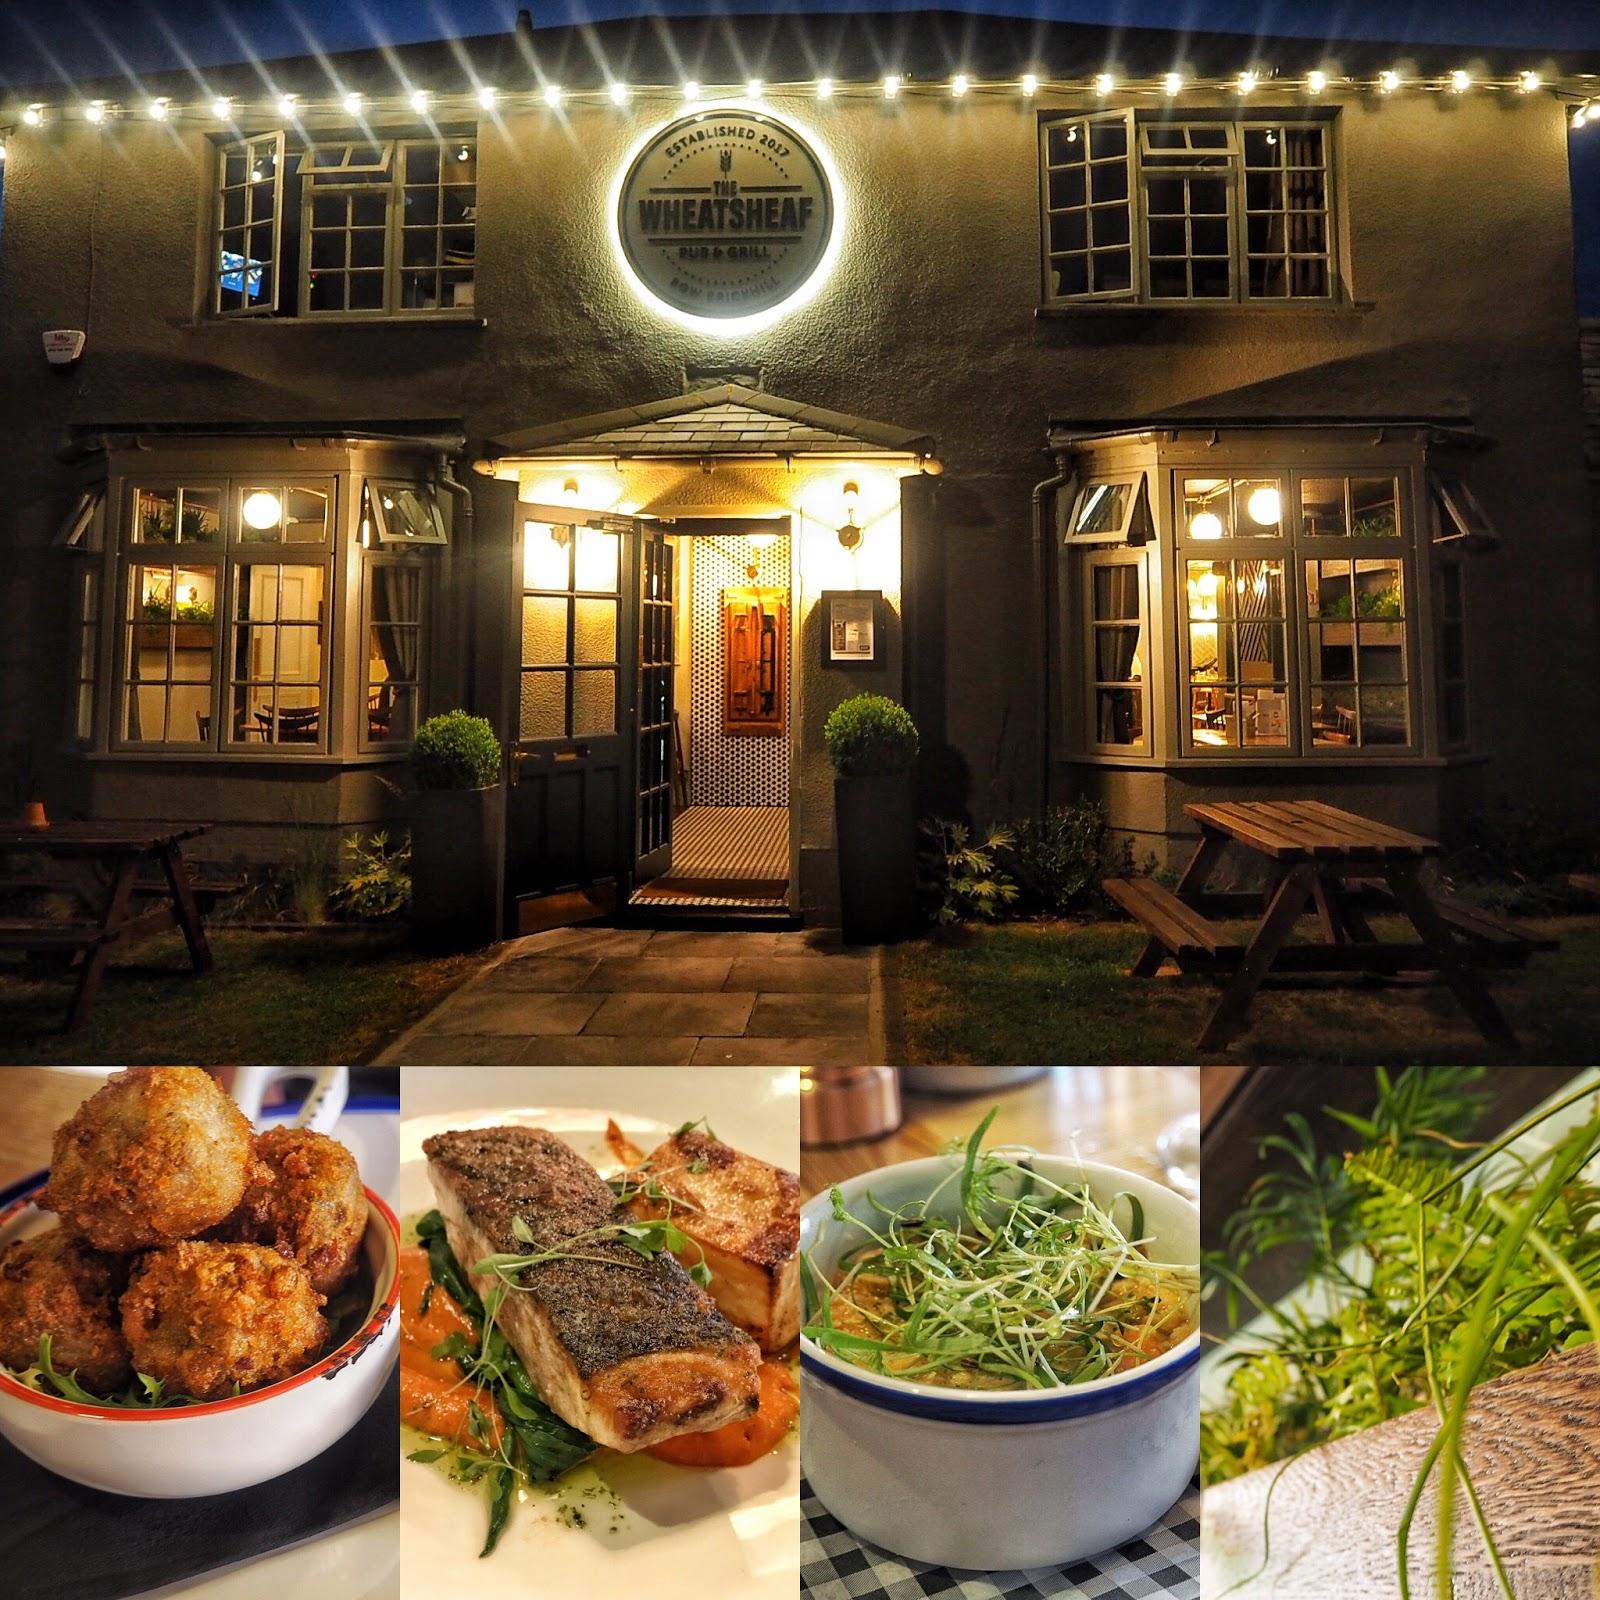 Food Review: The Wheatsheaf, Bow Brickhill